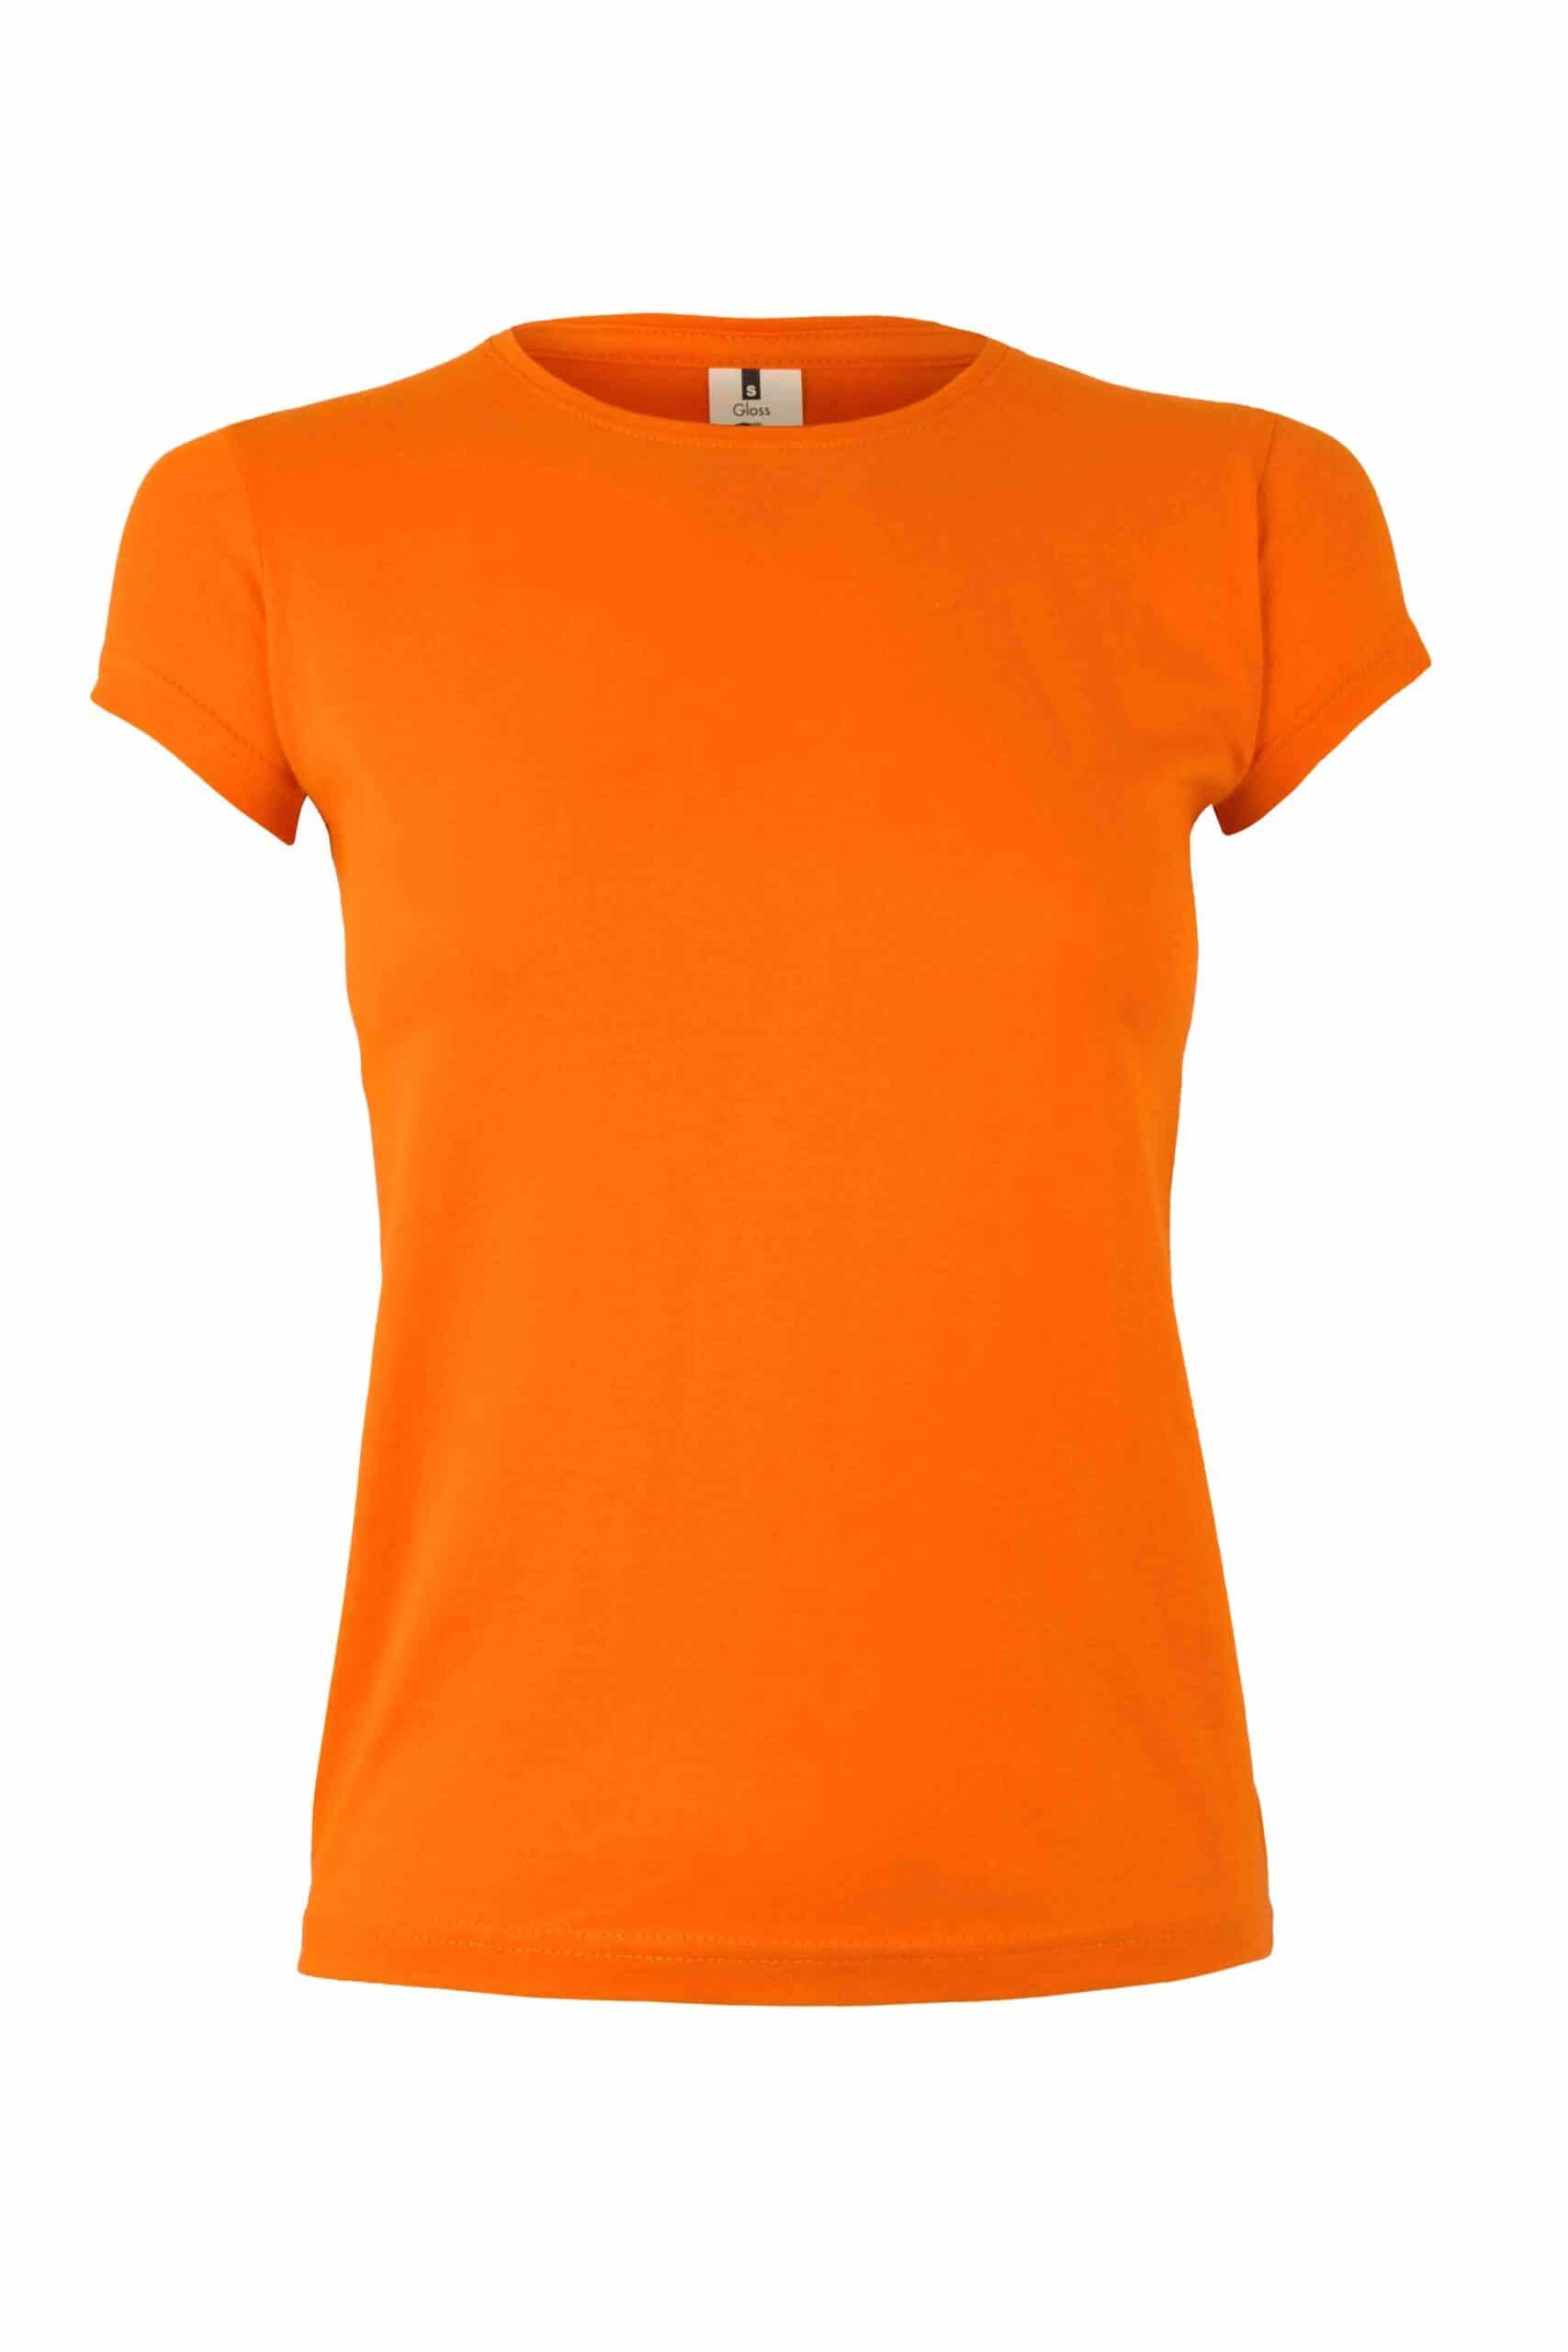 Mukua Mk170cv Camiseta Manga Corta 130gr Orange